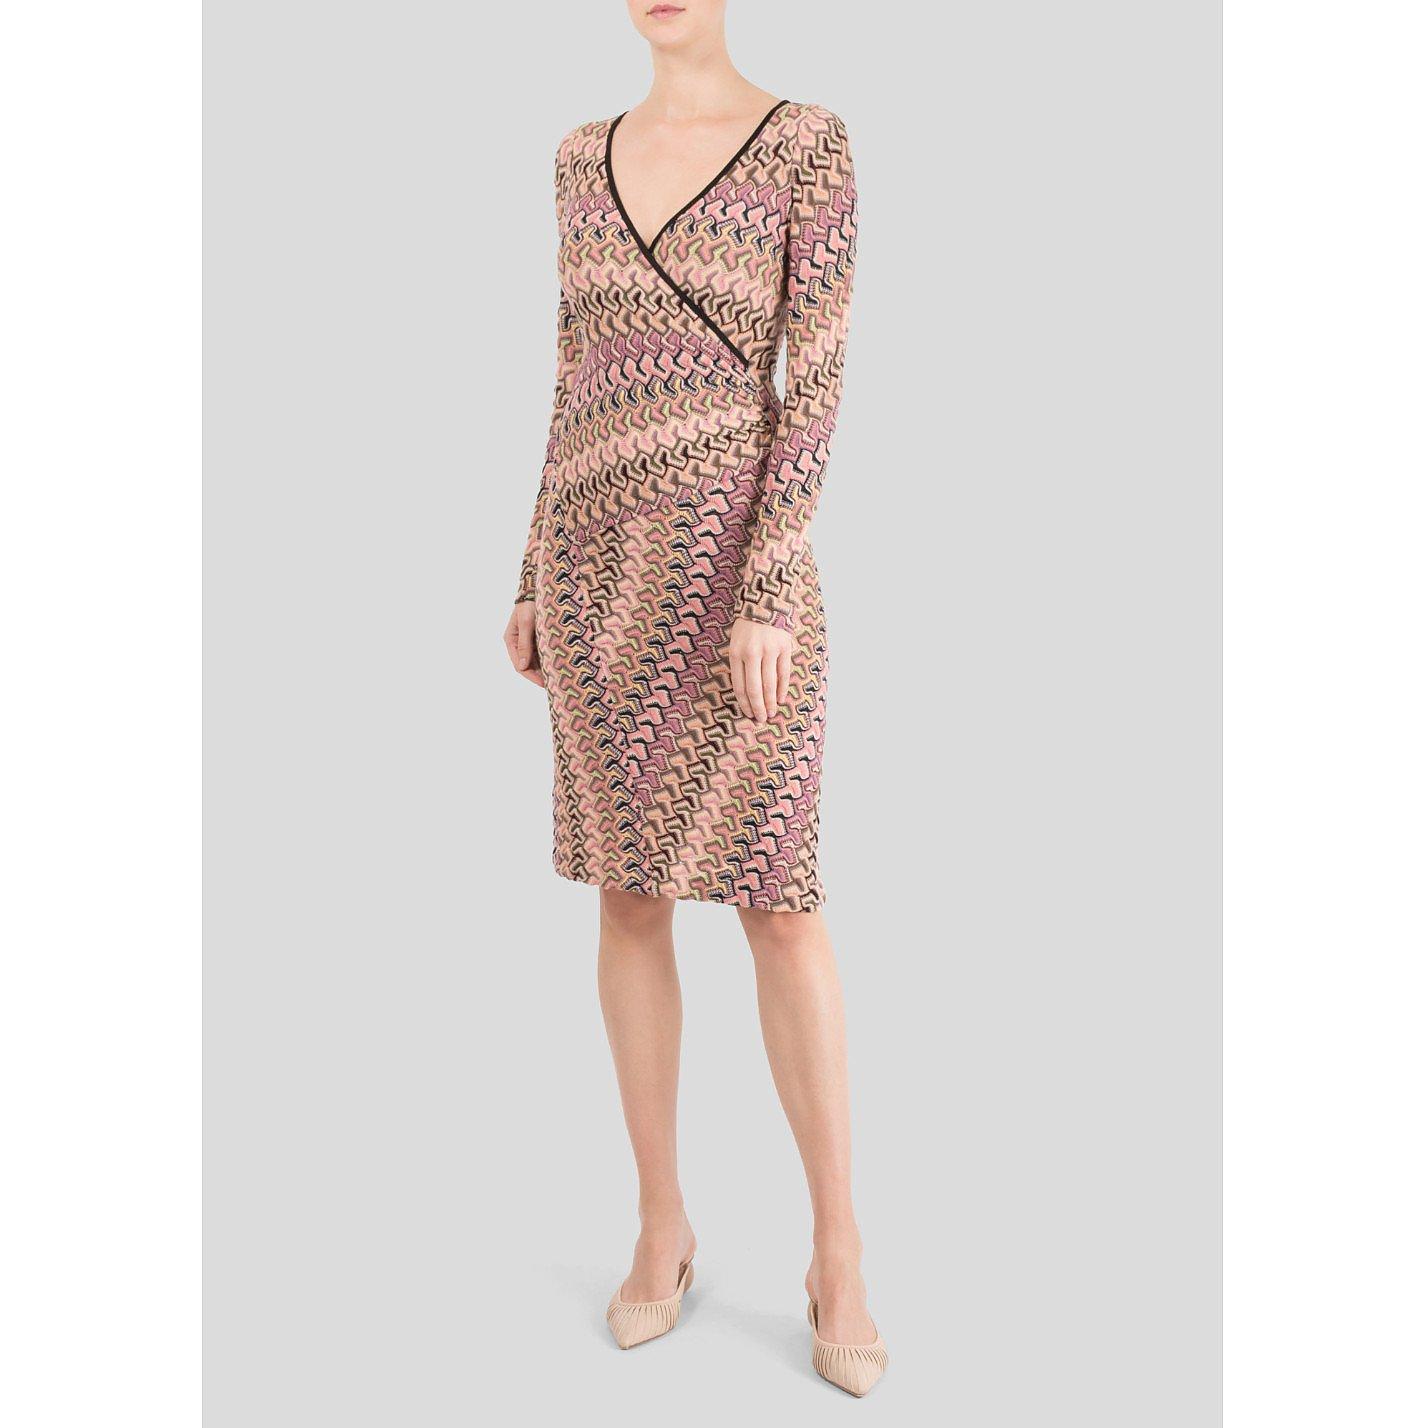 Missoni Multicolour Print Knit Dress